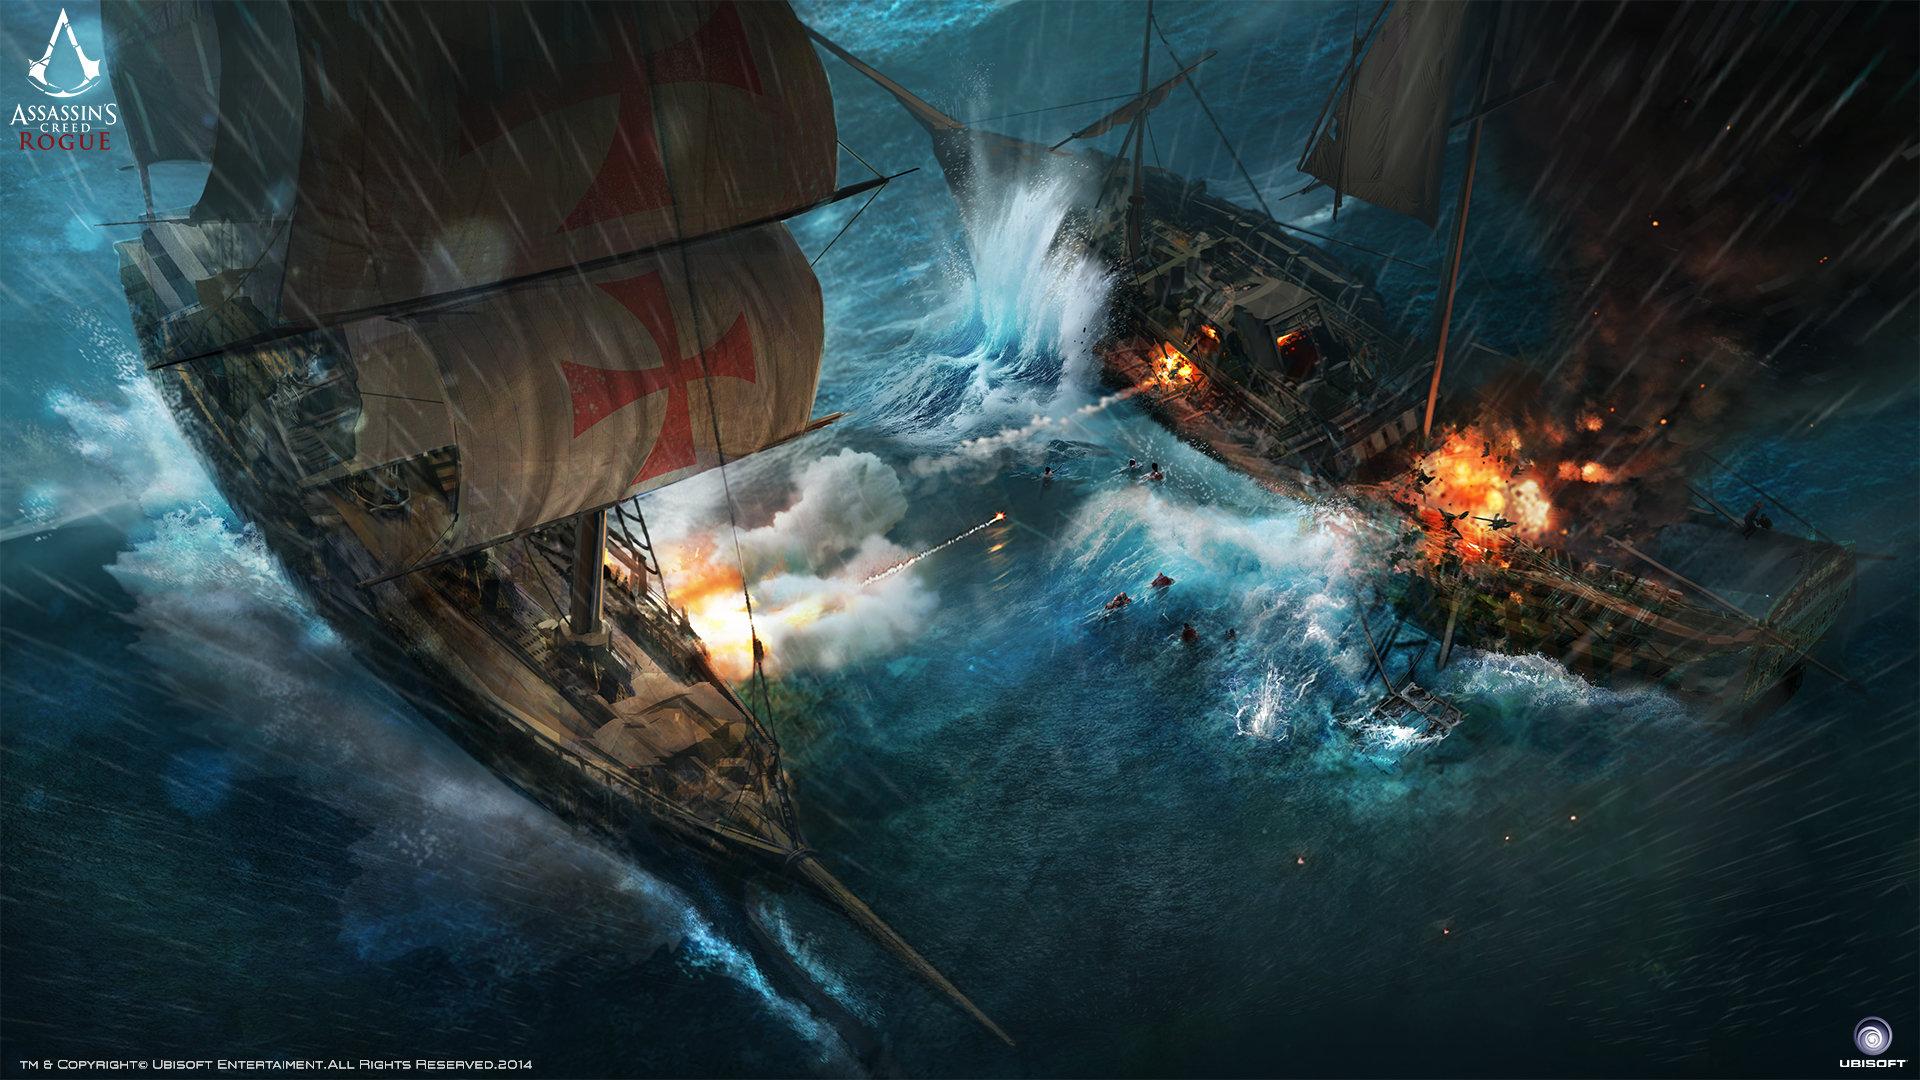 Free Download Assassin S Creed Rogue Wallpaper Id 231510 Hd 1080p